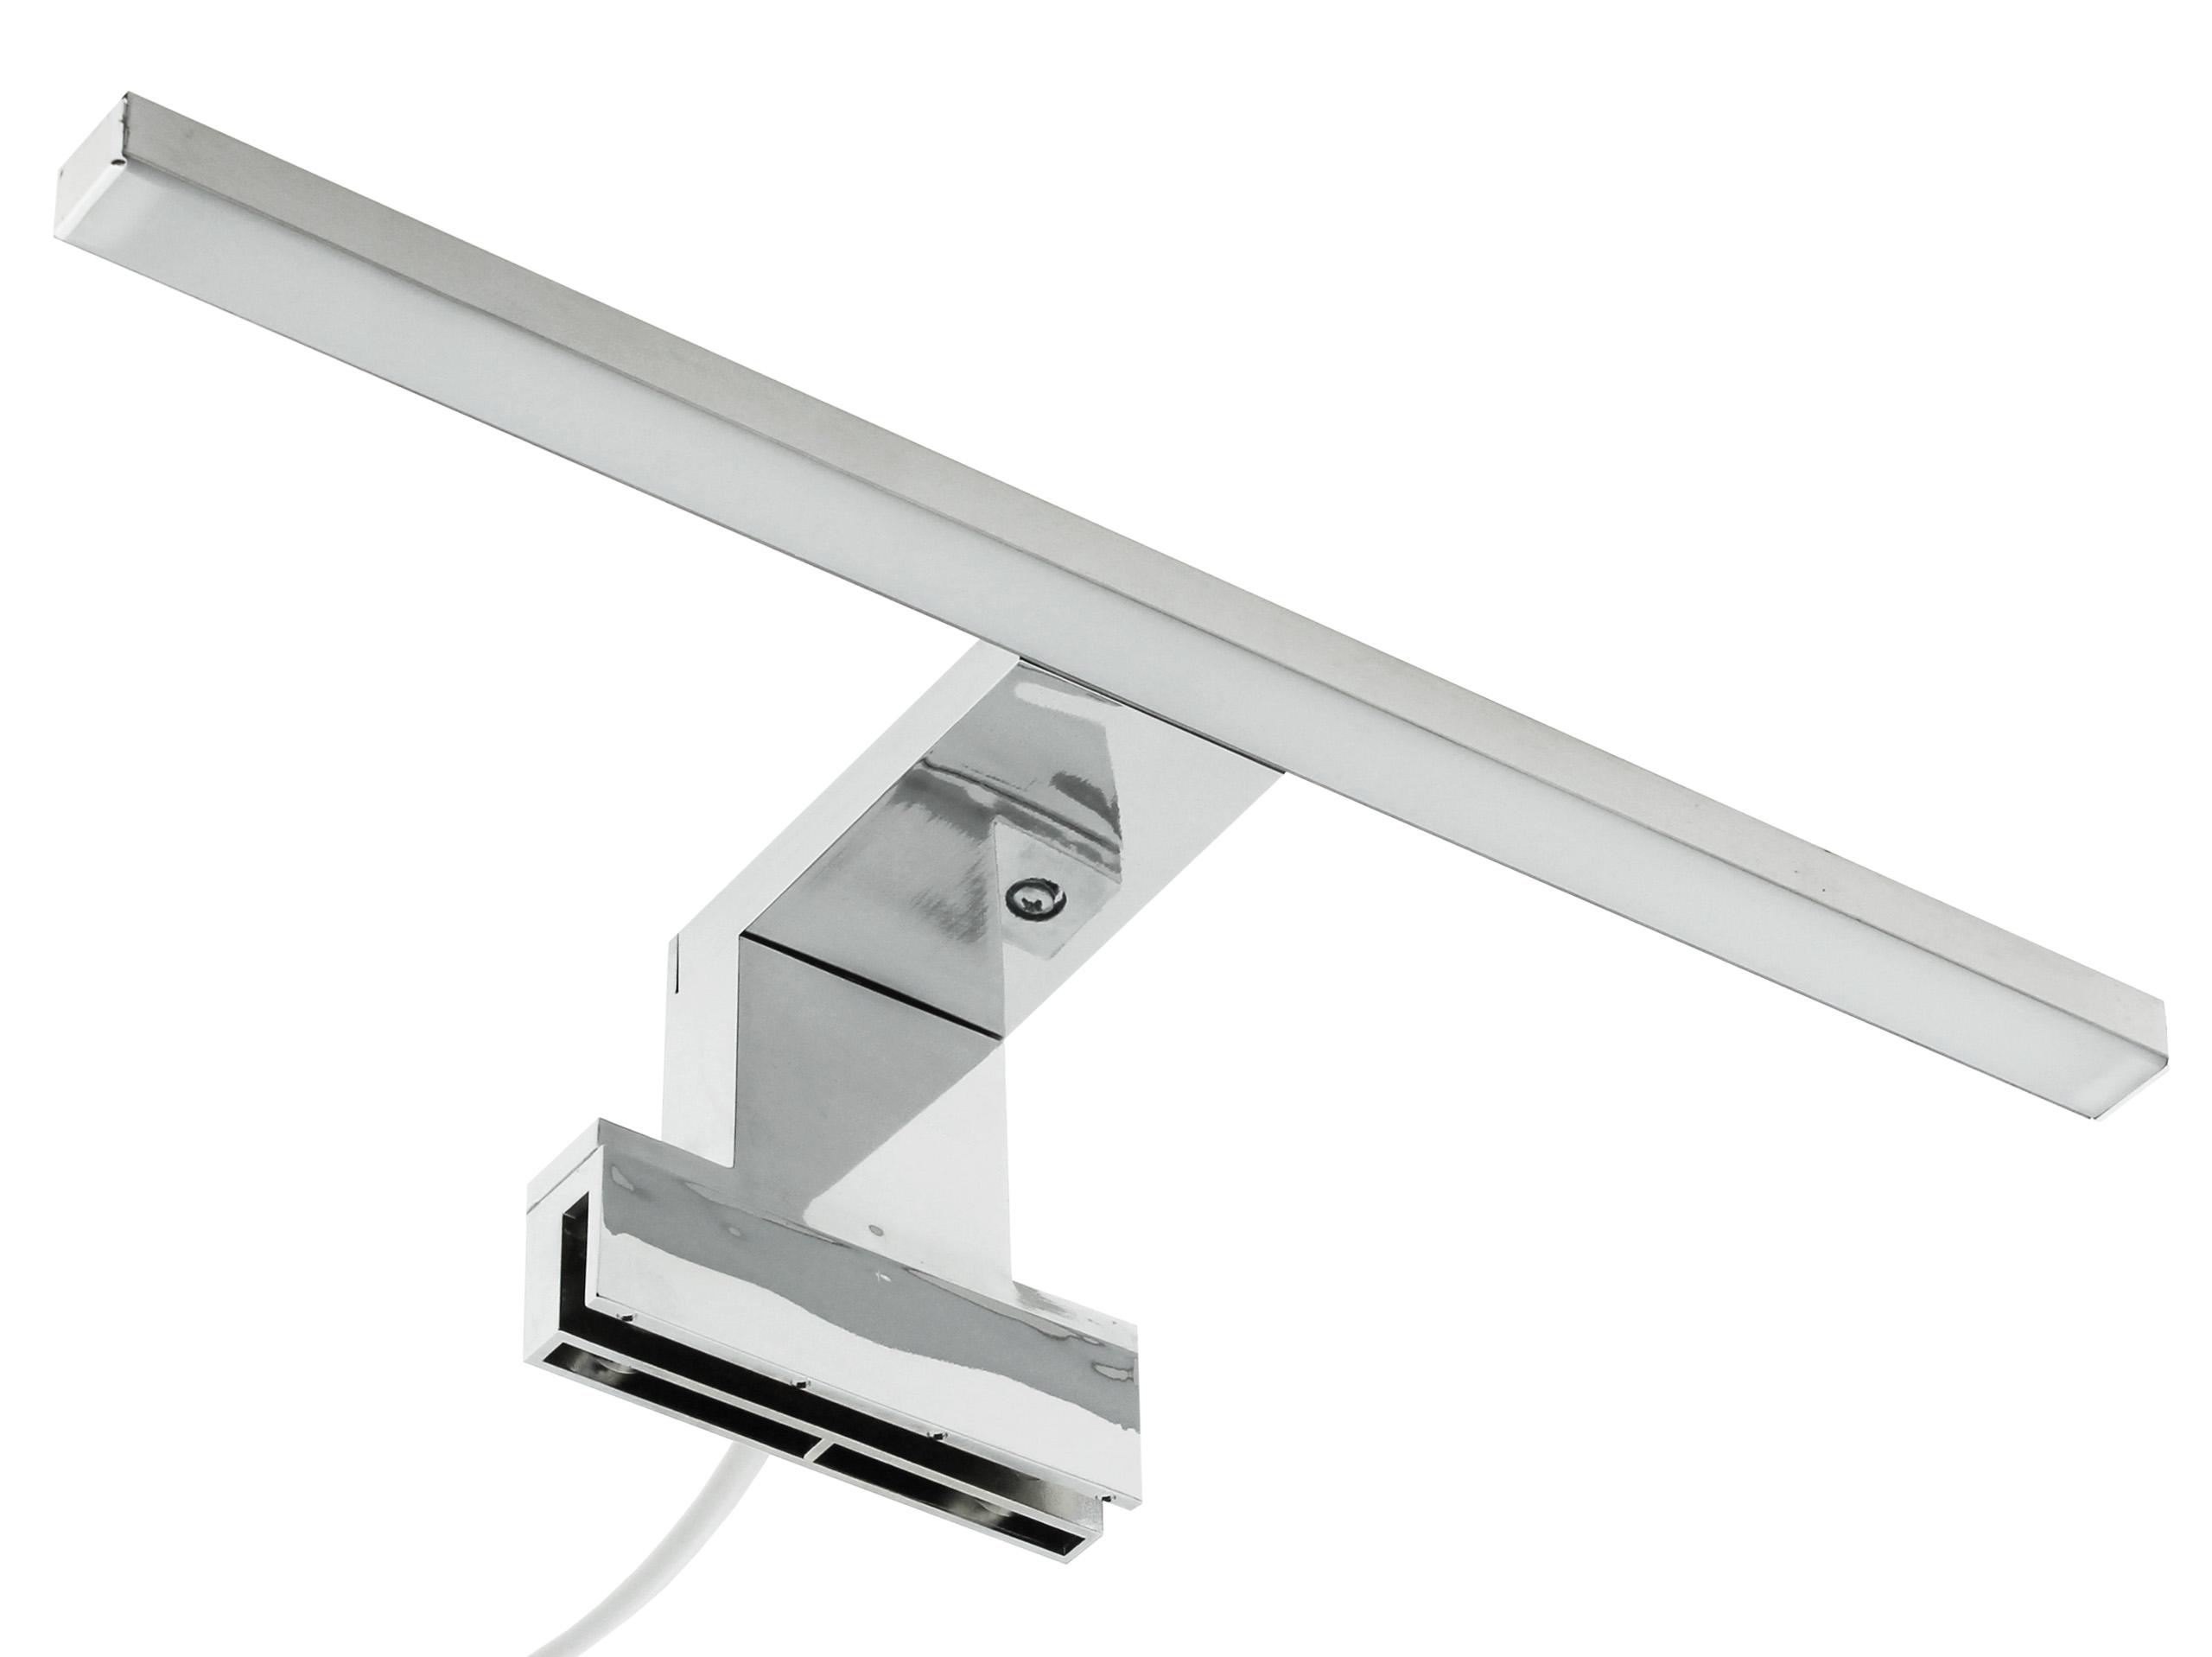 Furnika LED Lampa ALA 500 Furnika Barva: aluminium